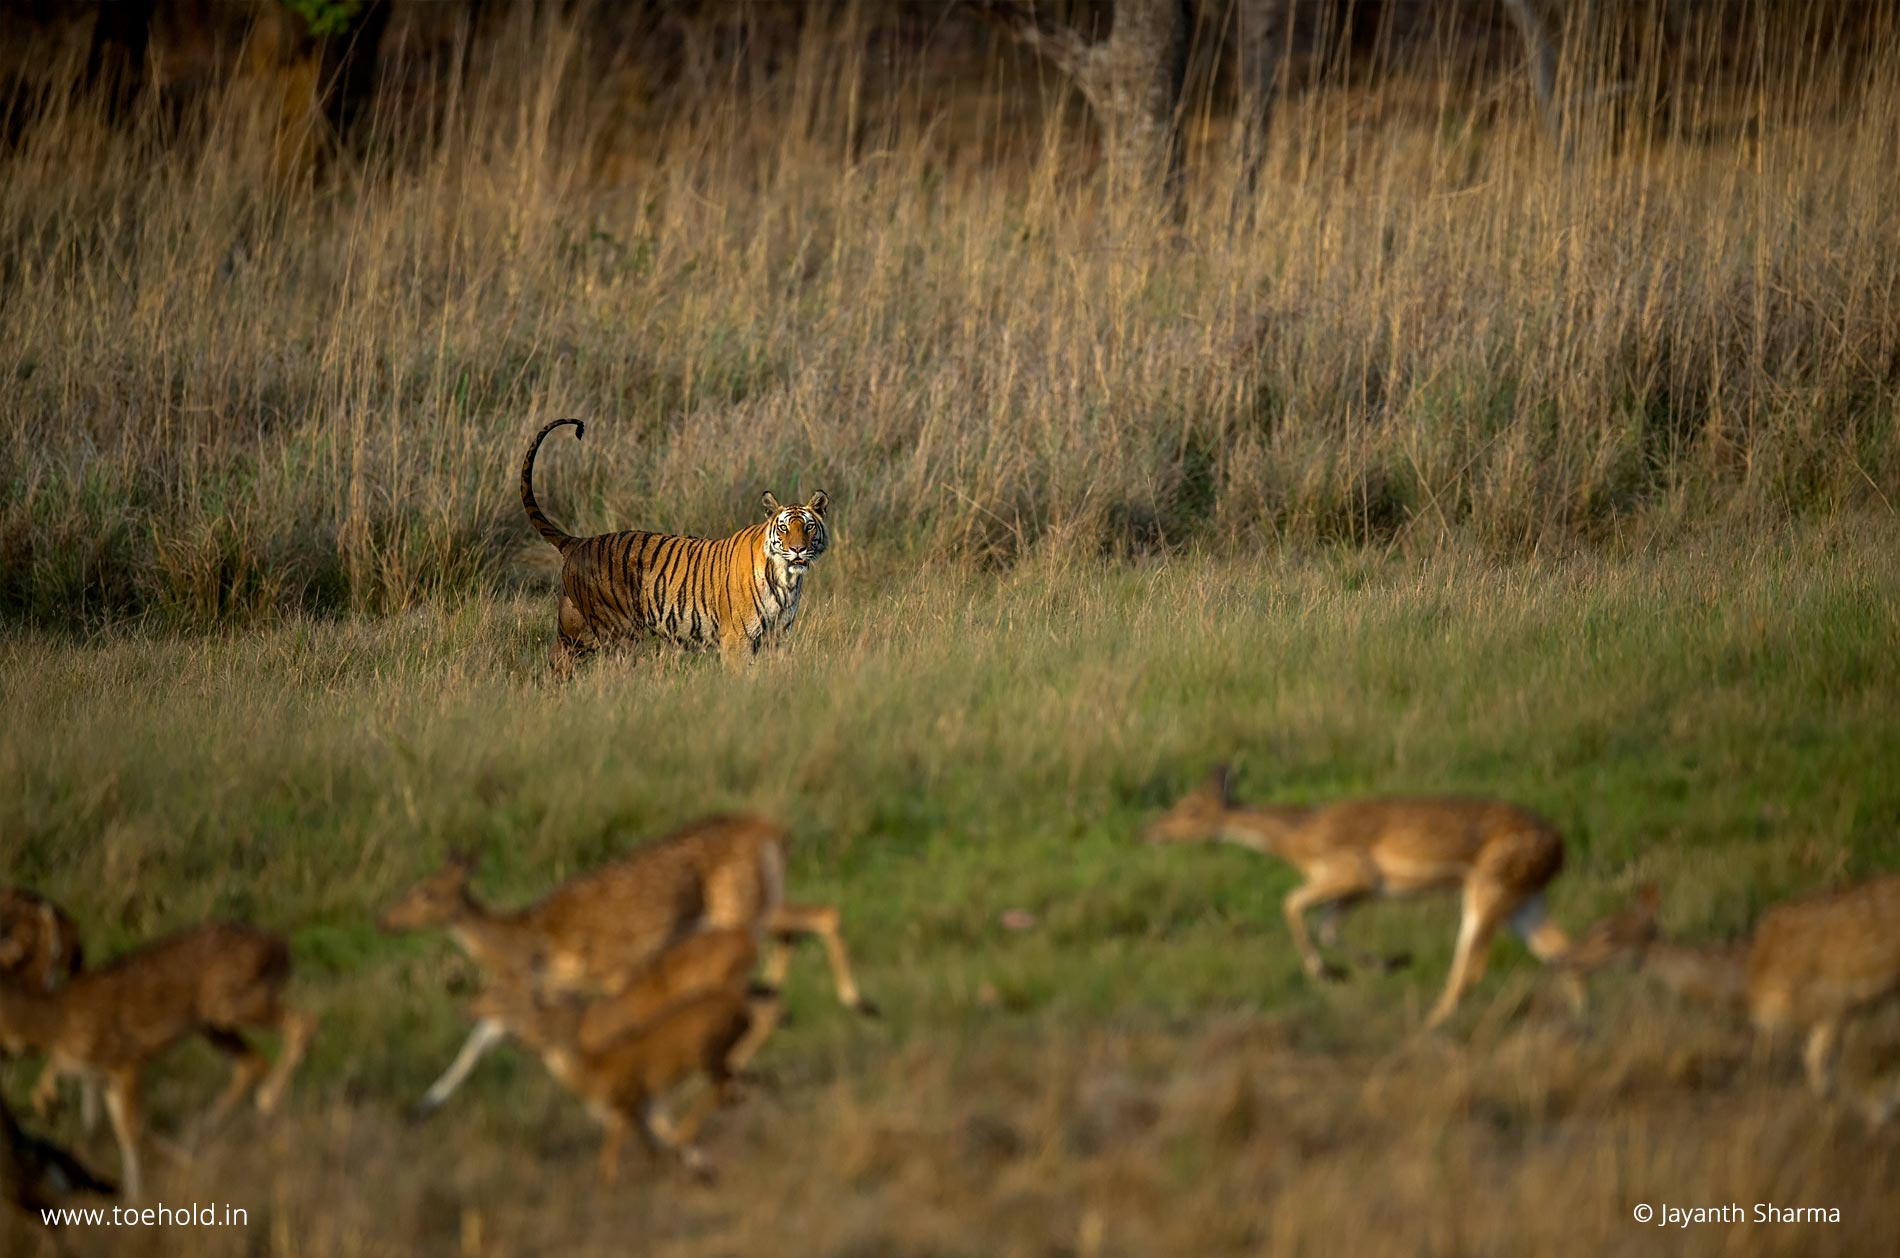 Rajbehra tiger, Bandhavgarh